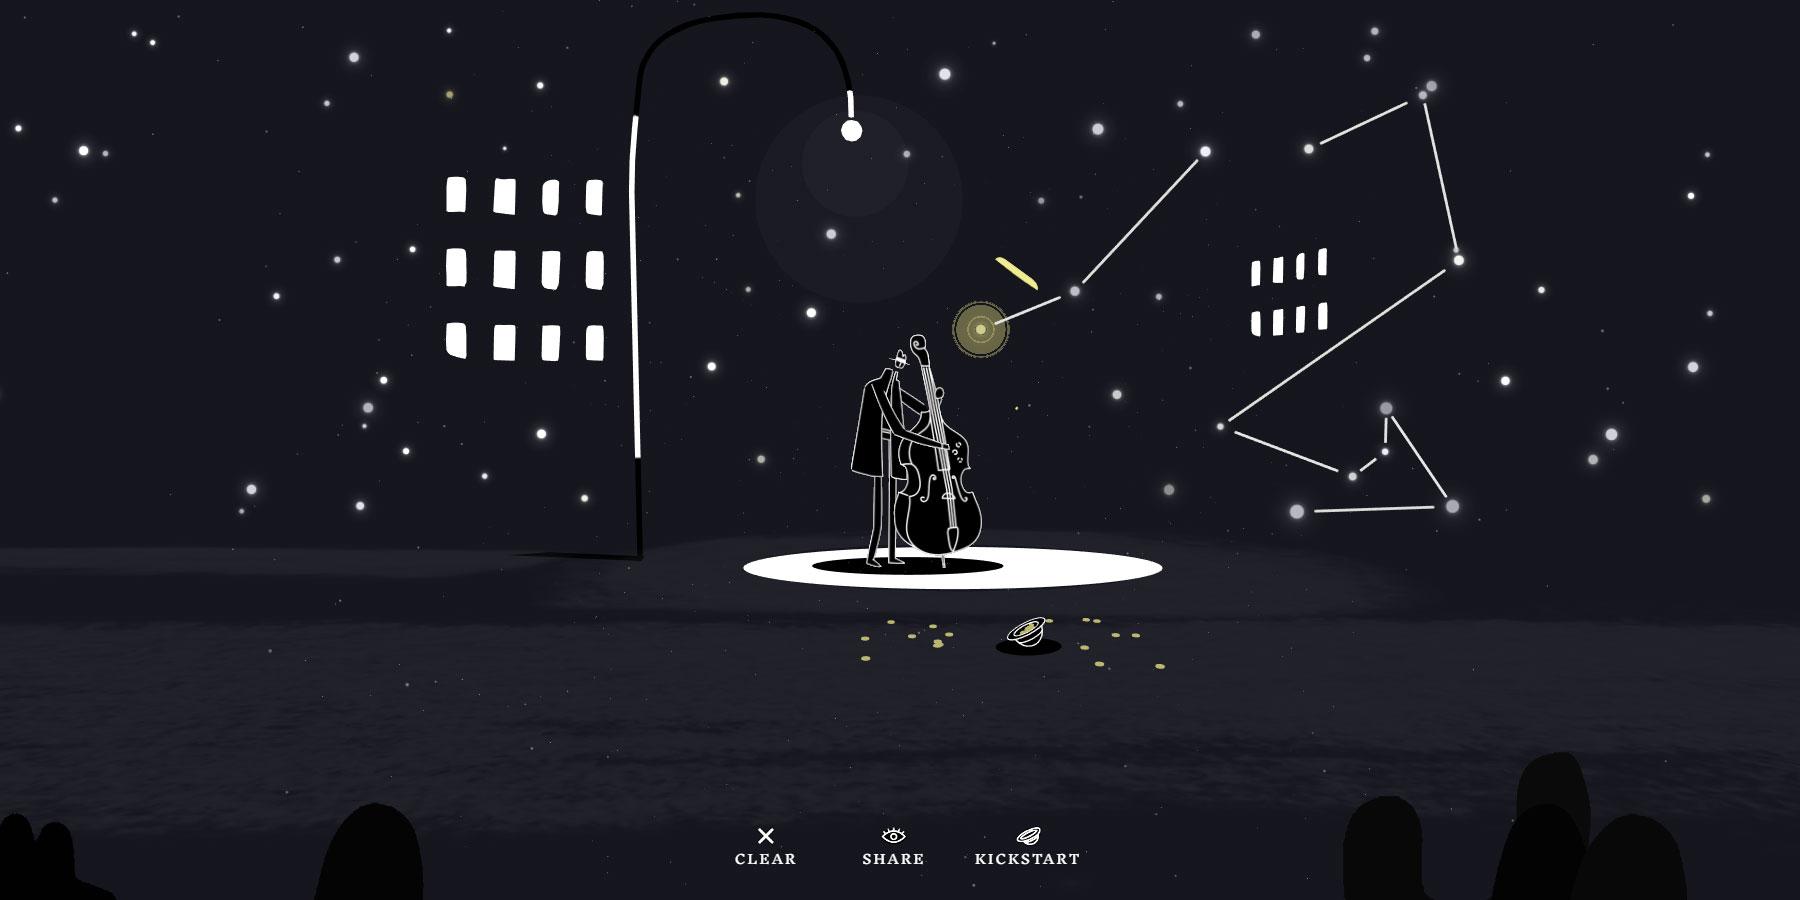 Genesis Noir - Busk 'til Dusk - Website of the Day